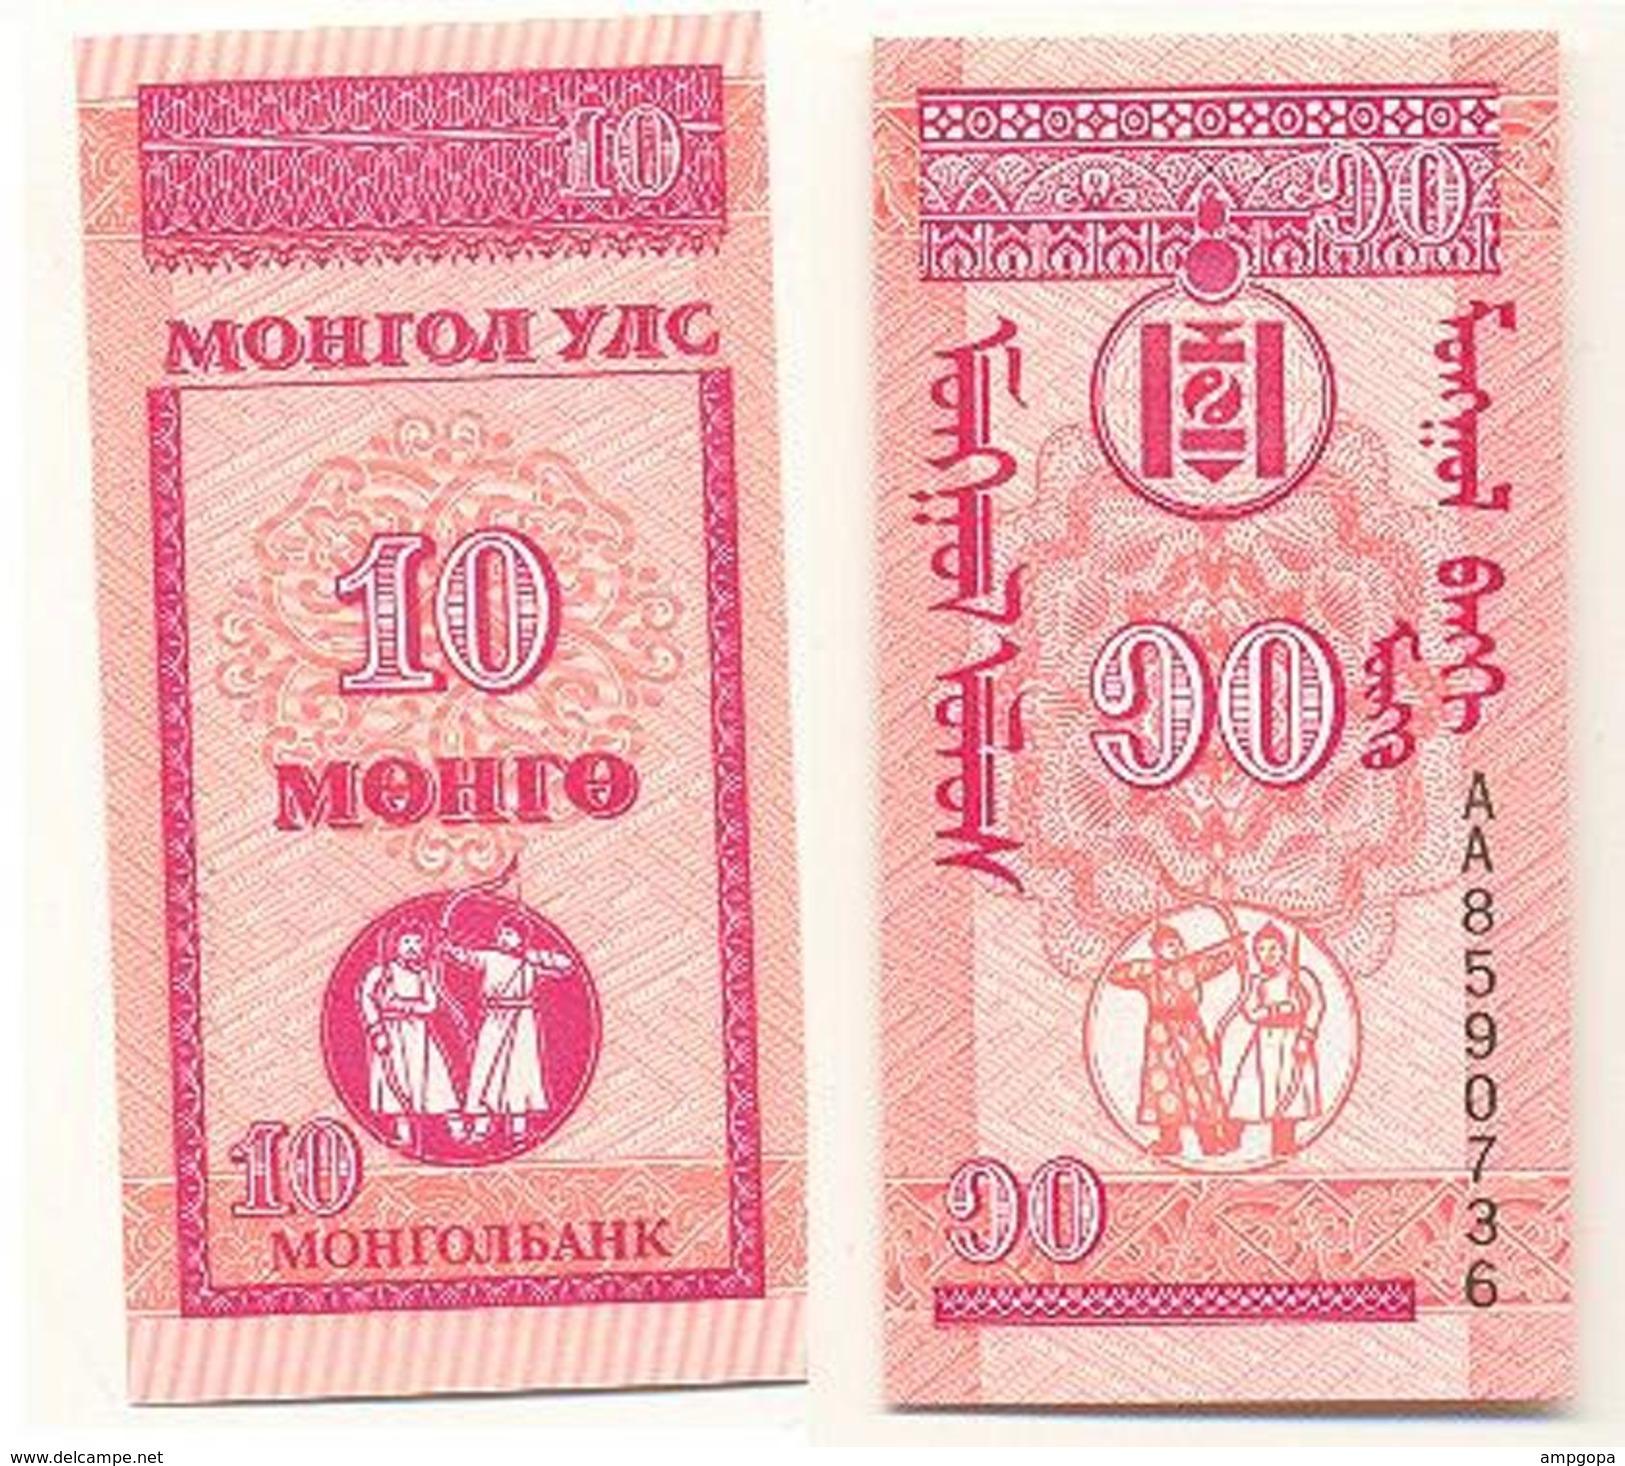 Mongolia 10 Mongo 1993 Pick 49 UNC - Mongolia